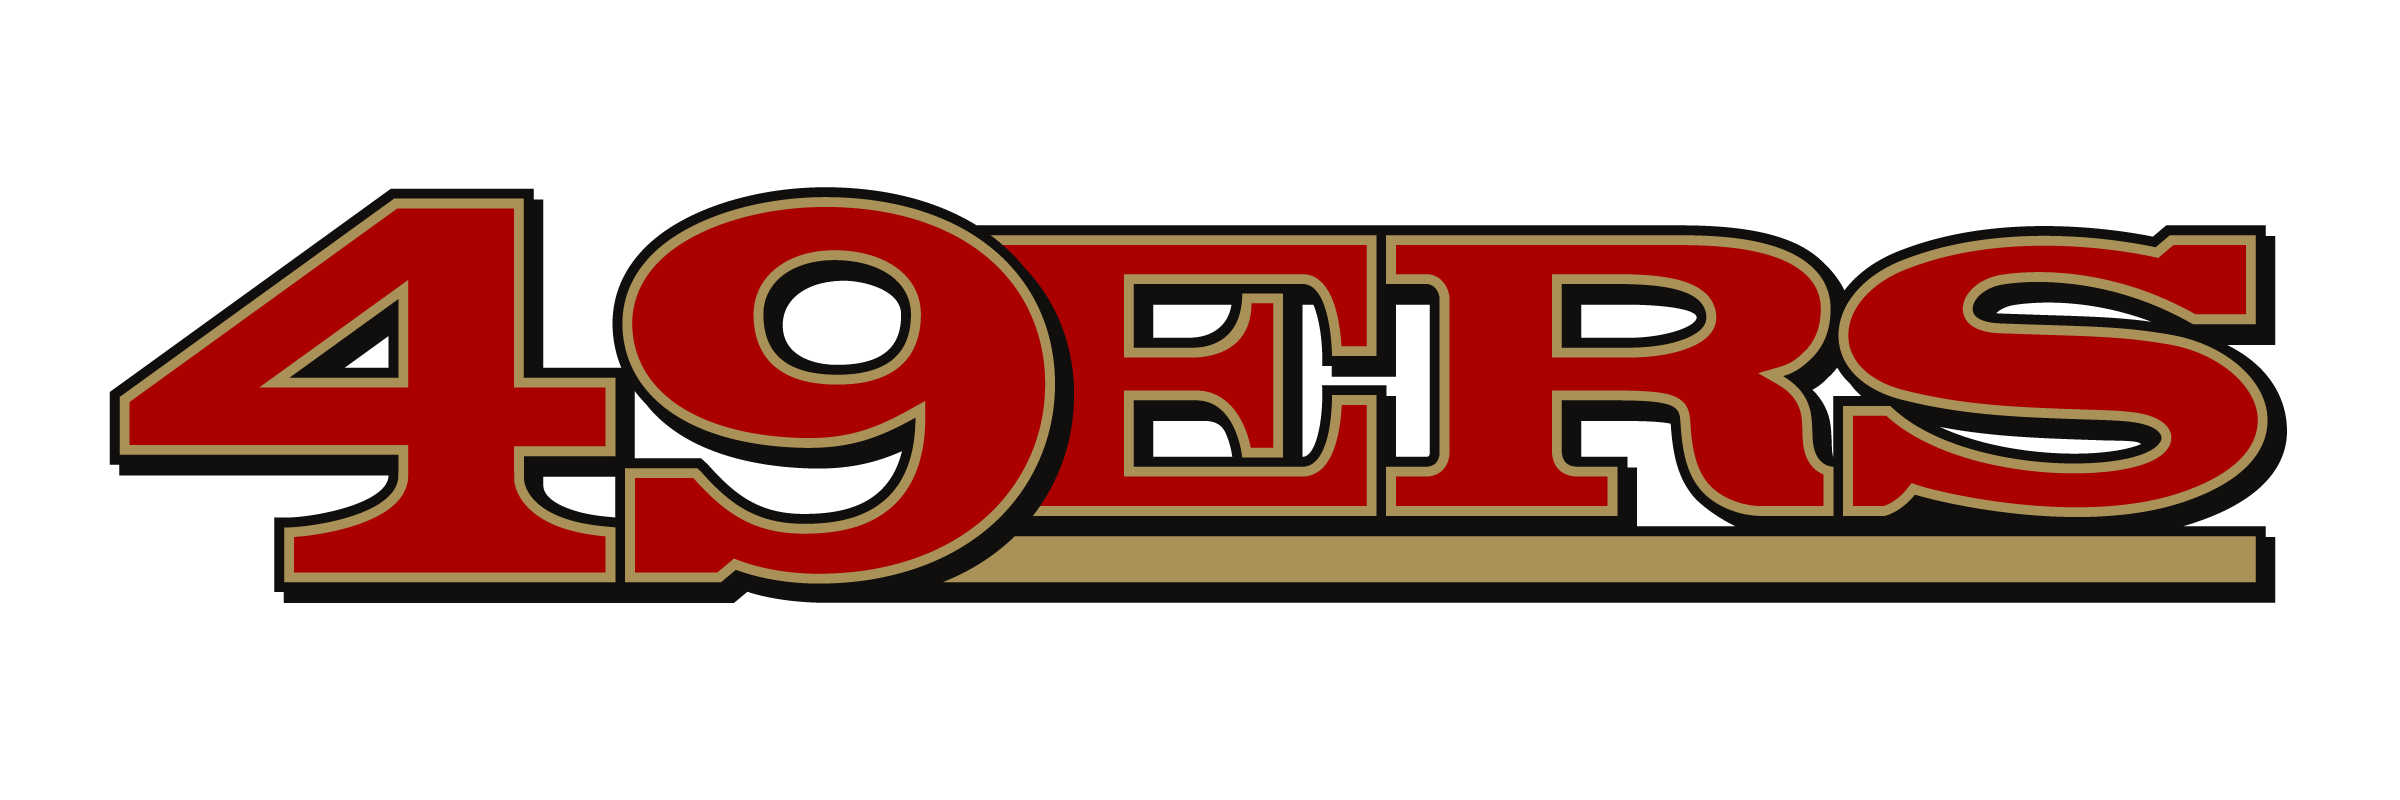 San Francisco 49ers Logo Png Transparent Svg Vector Freebie Supply In 2020 San Francisco 49ers Logo 49ers San Francisco 49ers